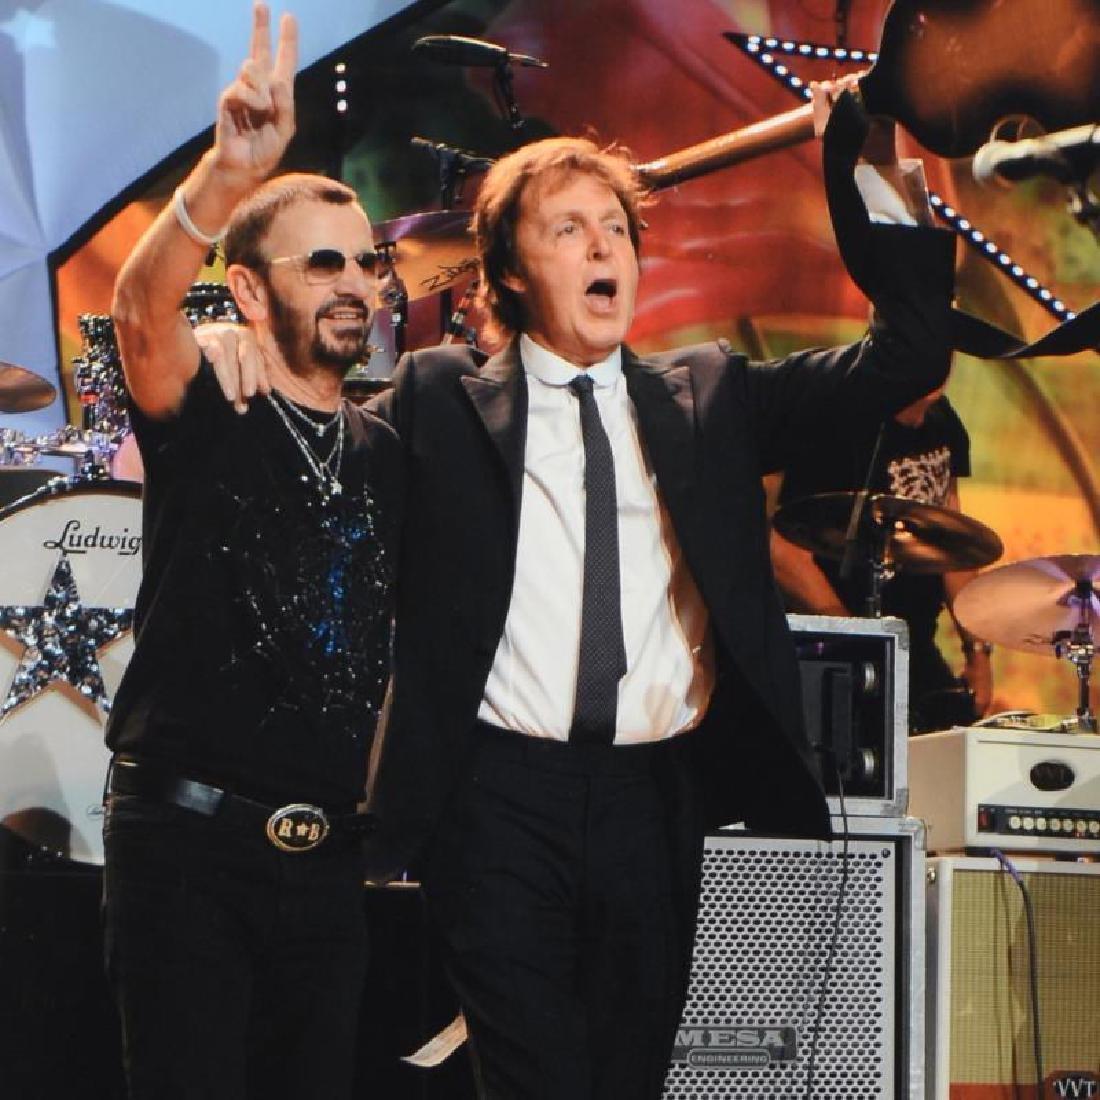 Ringo Starr & Paul McCartney by Shanahan, Rob - 2